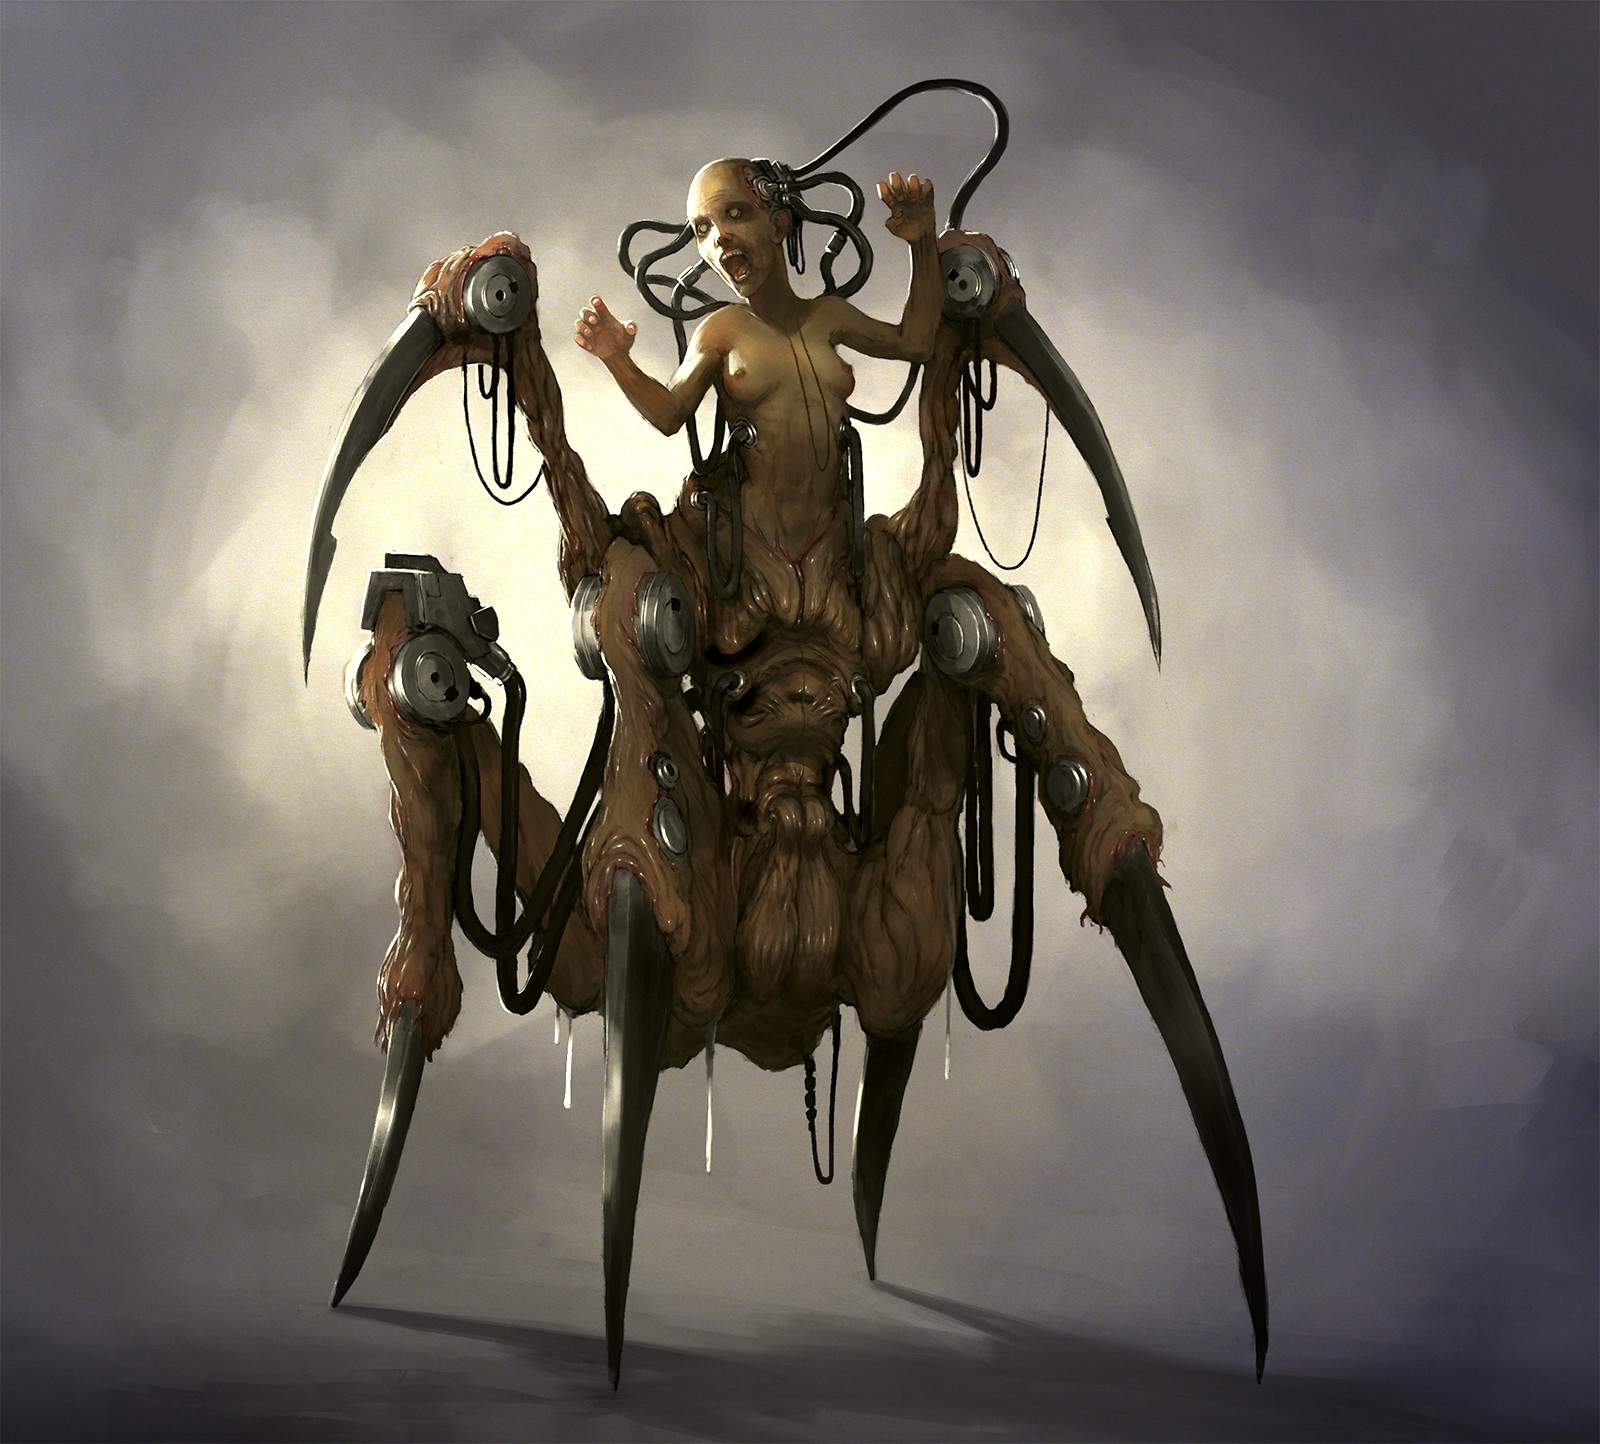 Ilhan yilmaz mechanoid concept 04